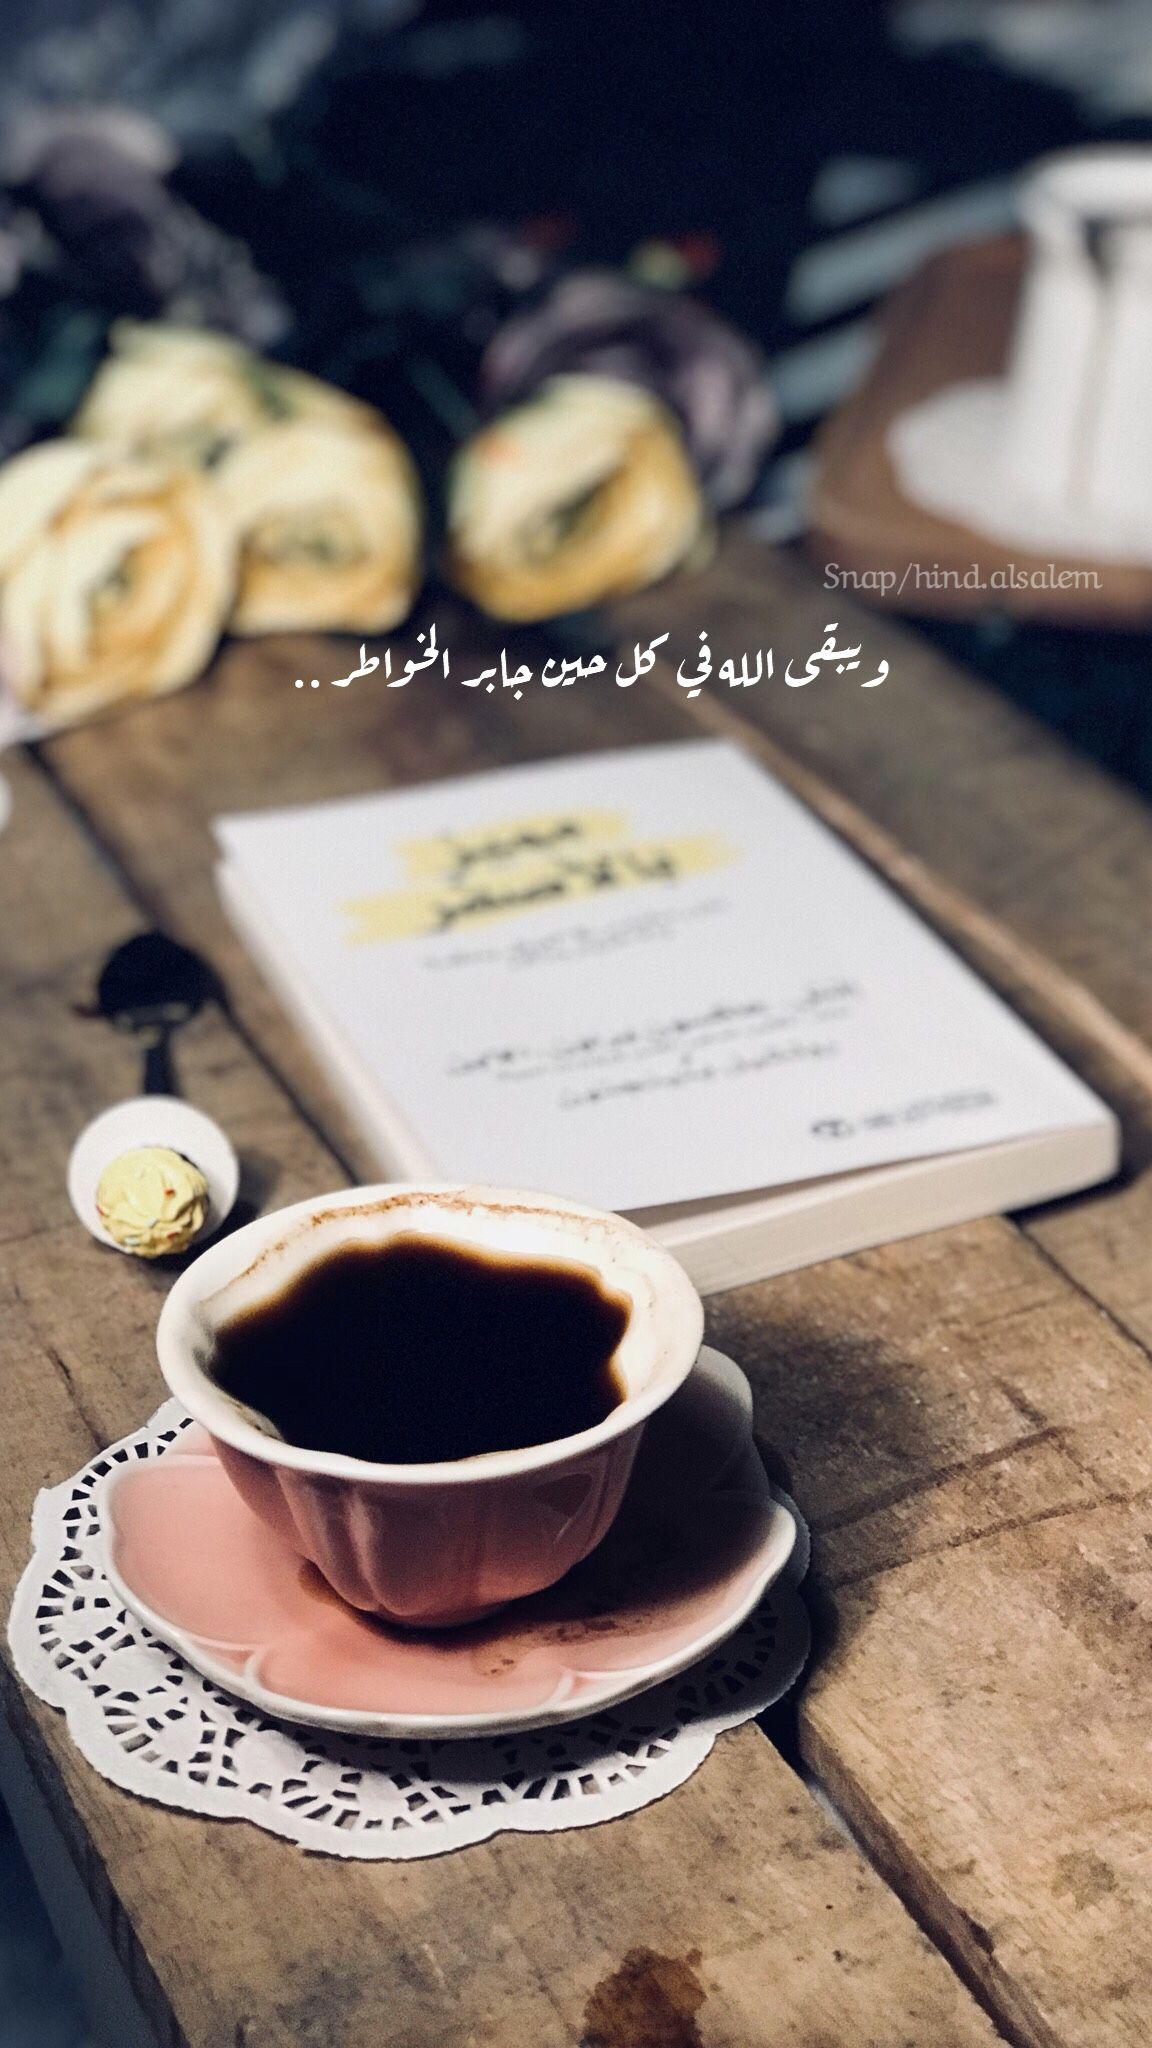 دعاء صورة افكار تصوير احترافيه Coffee Coffeetime قهوه كوفي تكوين عدسه سناب Pictures كلام كلمات حب عشق Food I Love Coffee Coffee Pictures